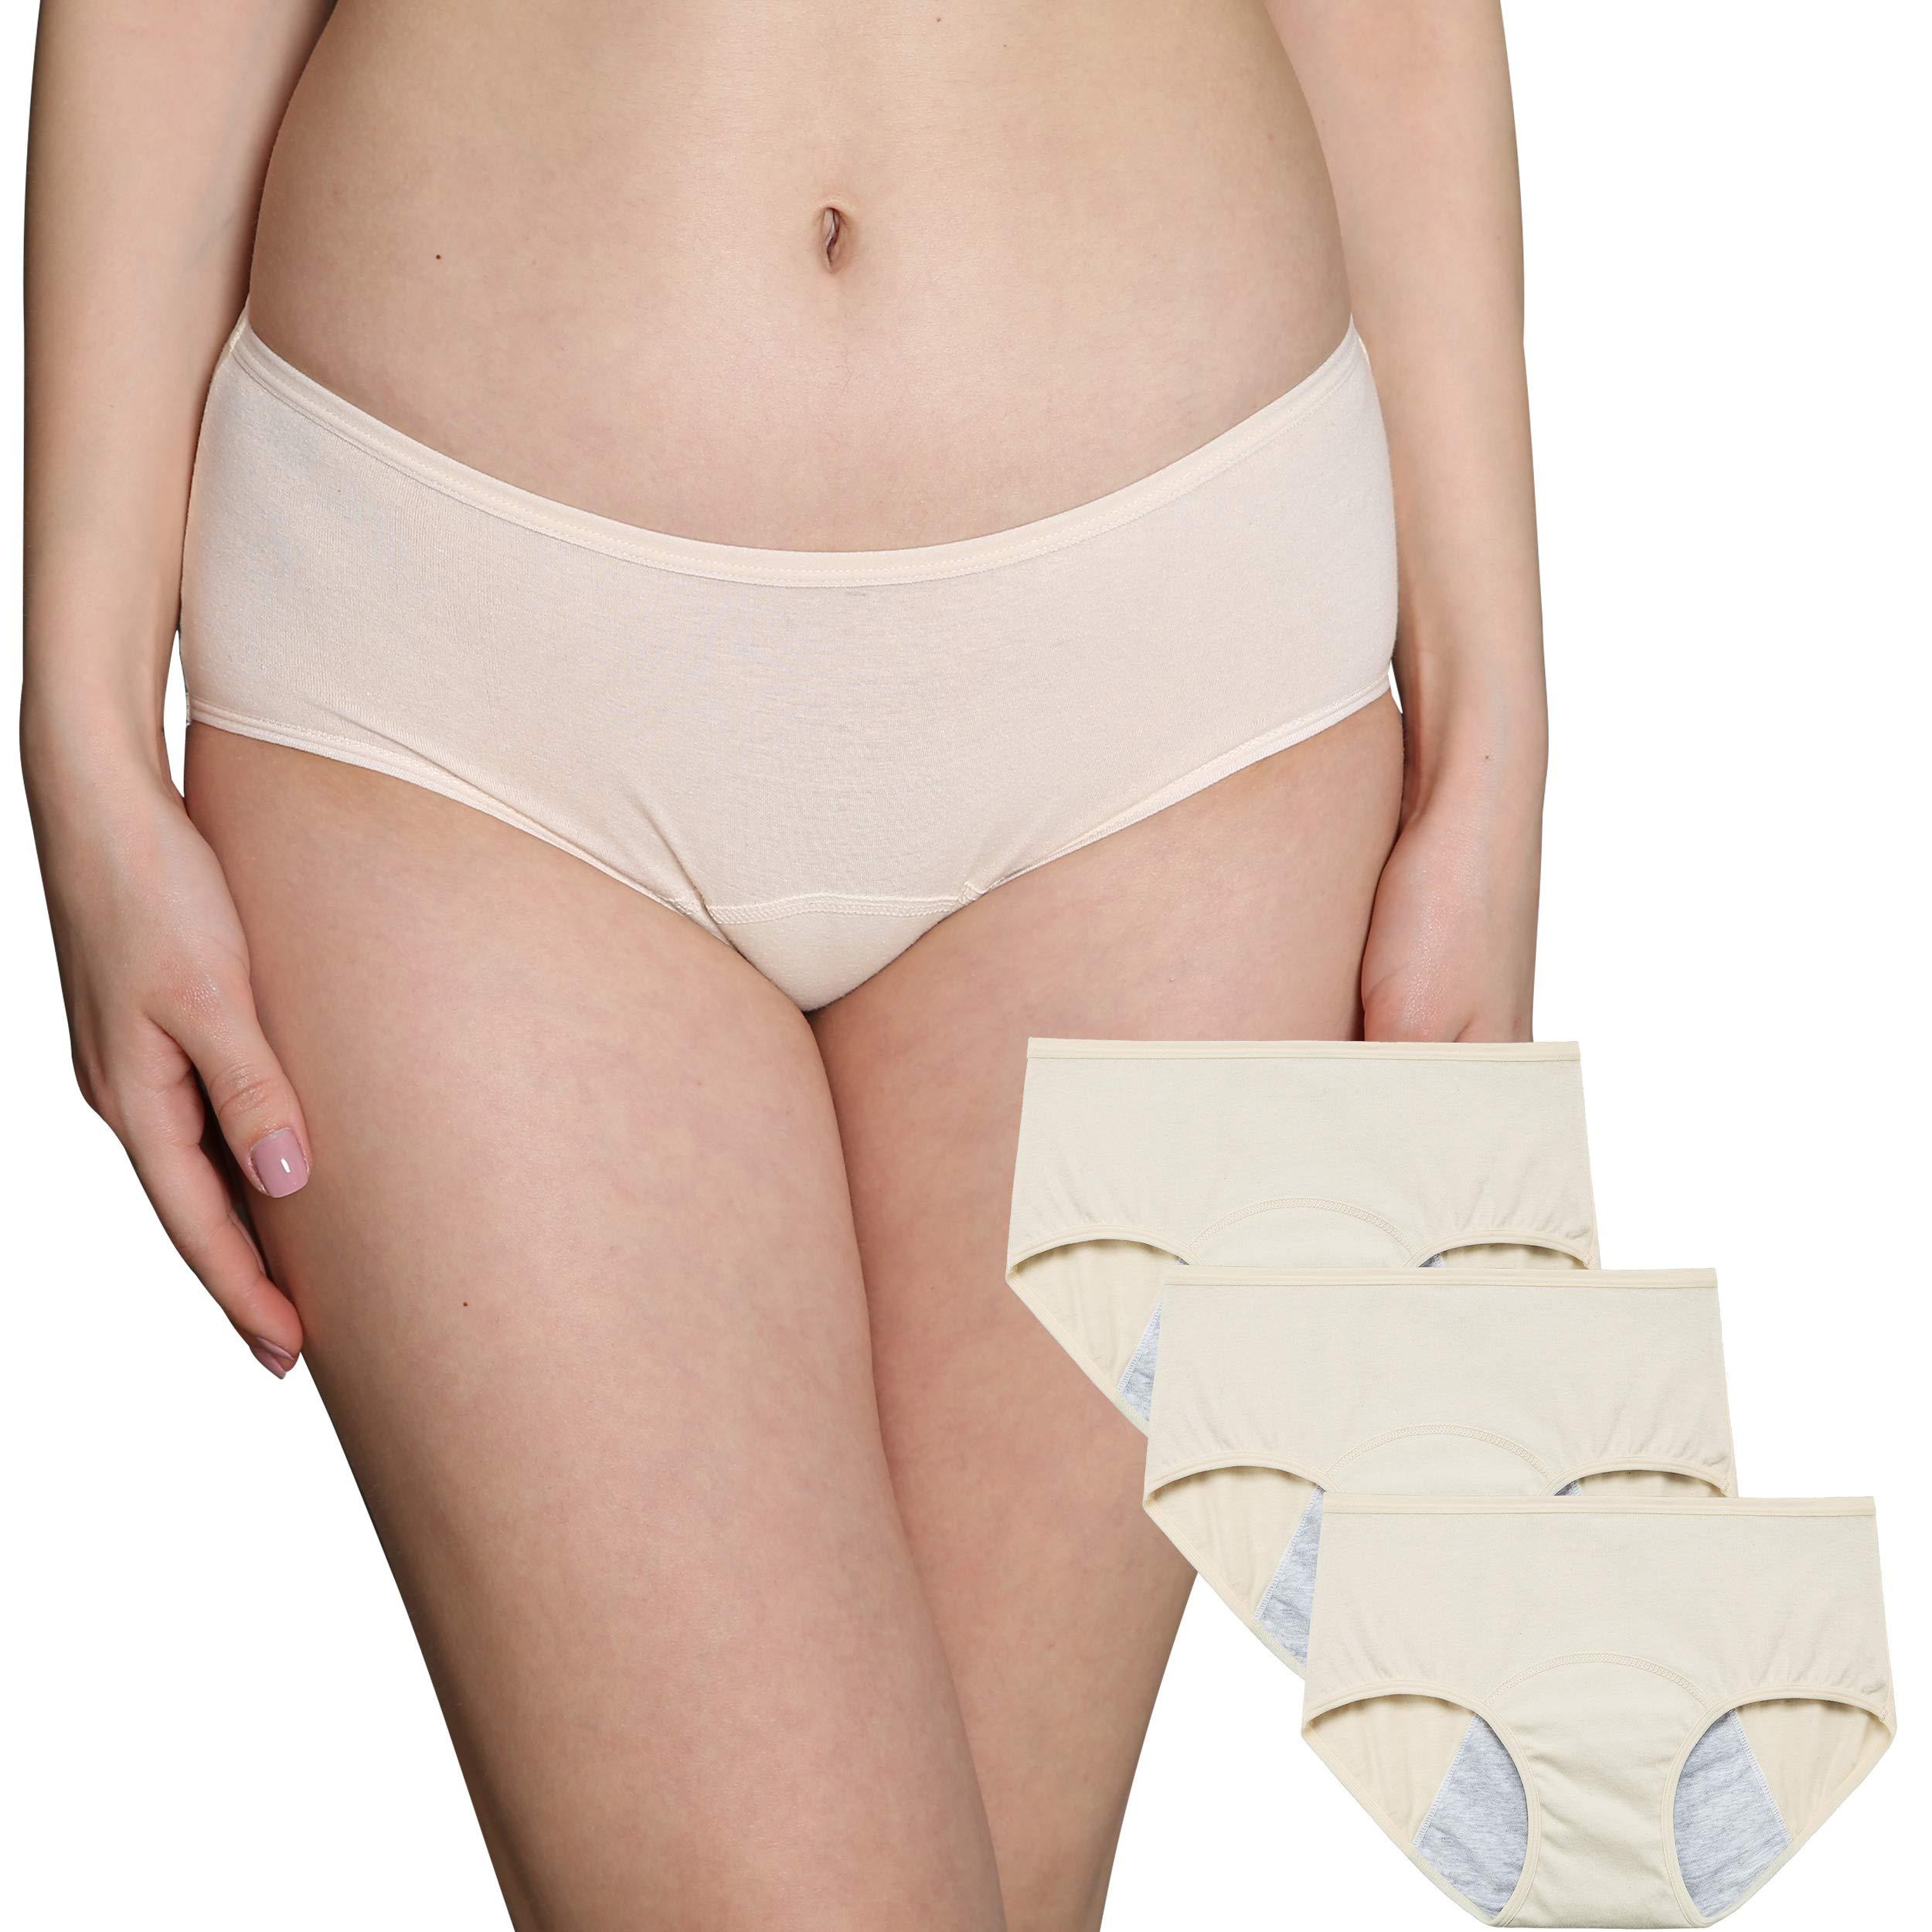 b2eba3c96644 INNERSY Women's Menstrual Cycle Panties Low Rise Postpartum Briefs Elastic  Leakproof Period Underwear Cotton C Section